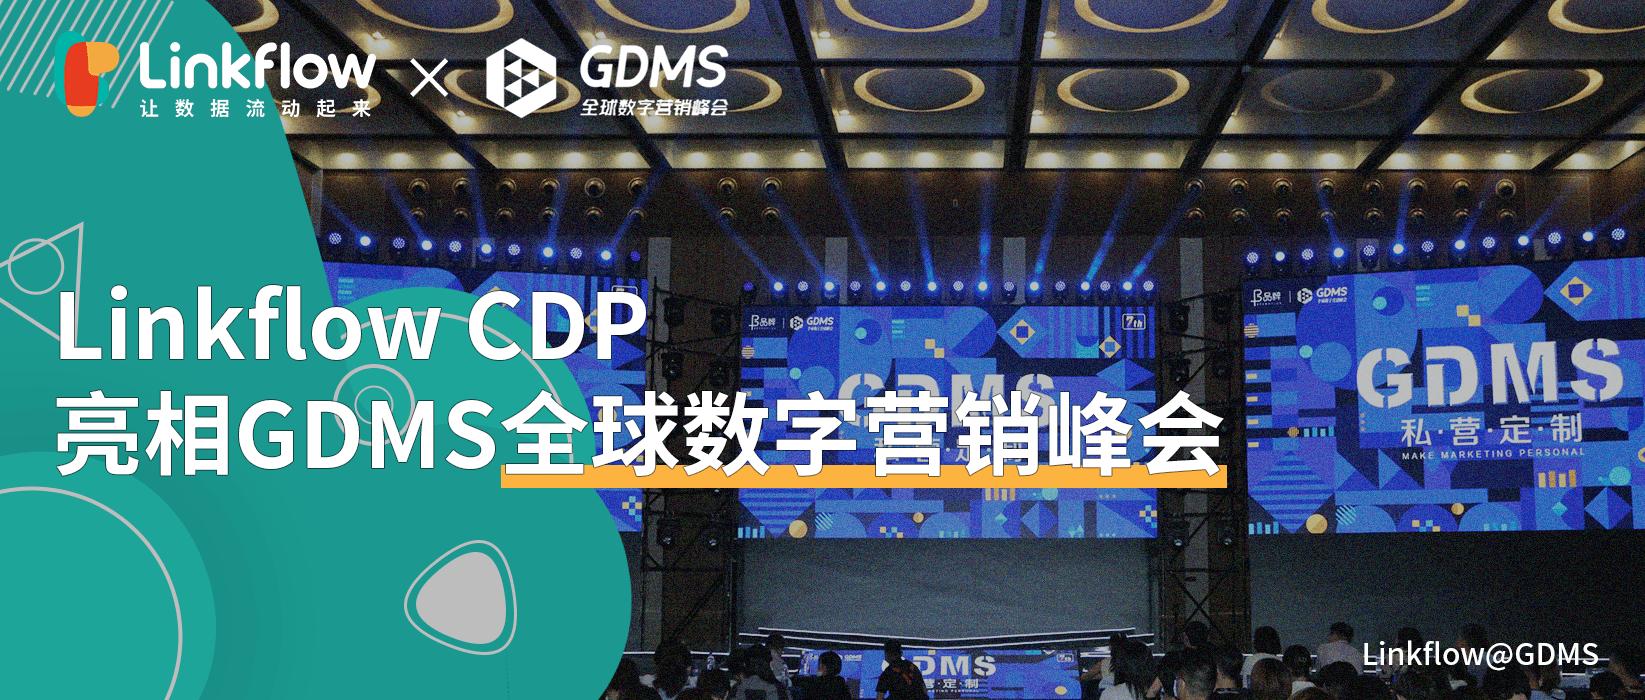 Linkflow CDP亮相GDMS全球数字营销峰会